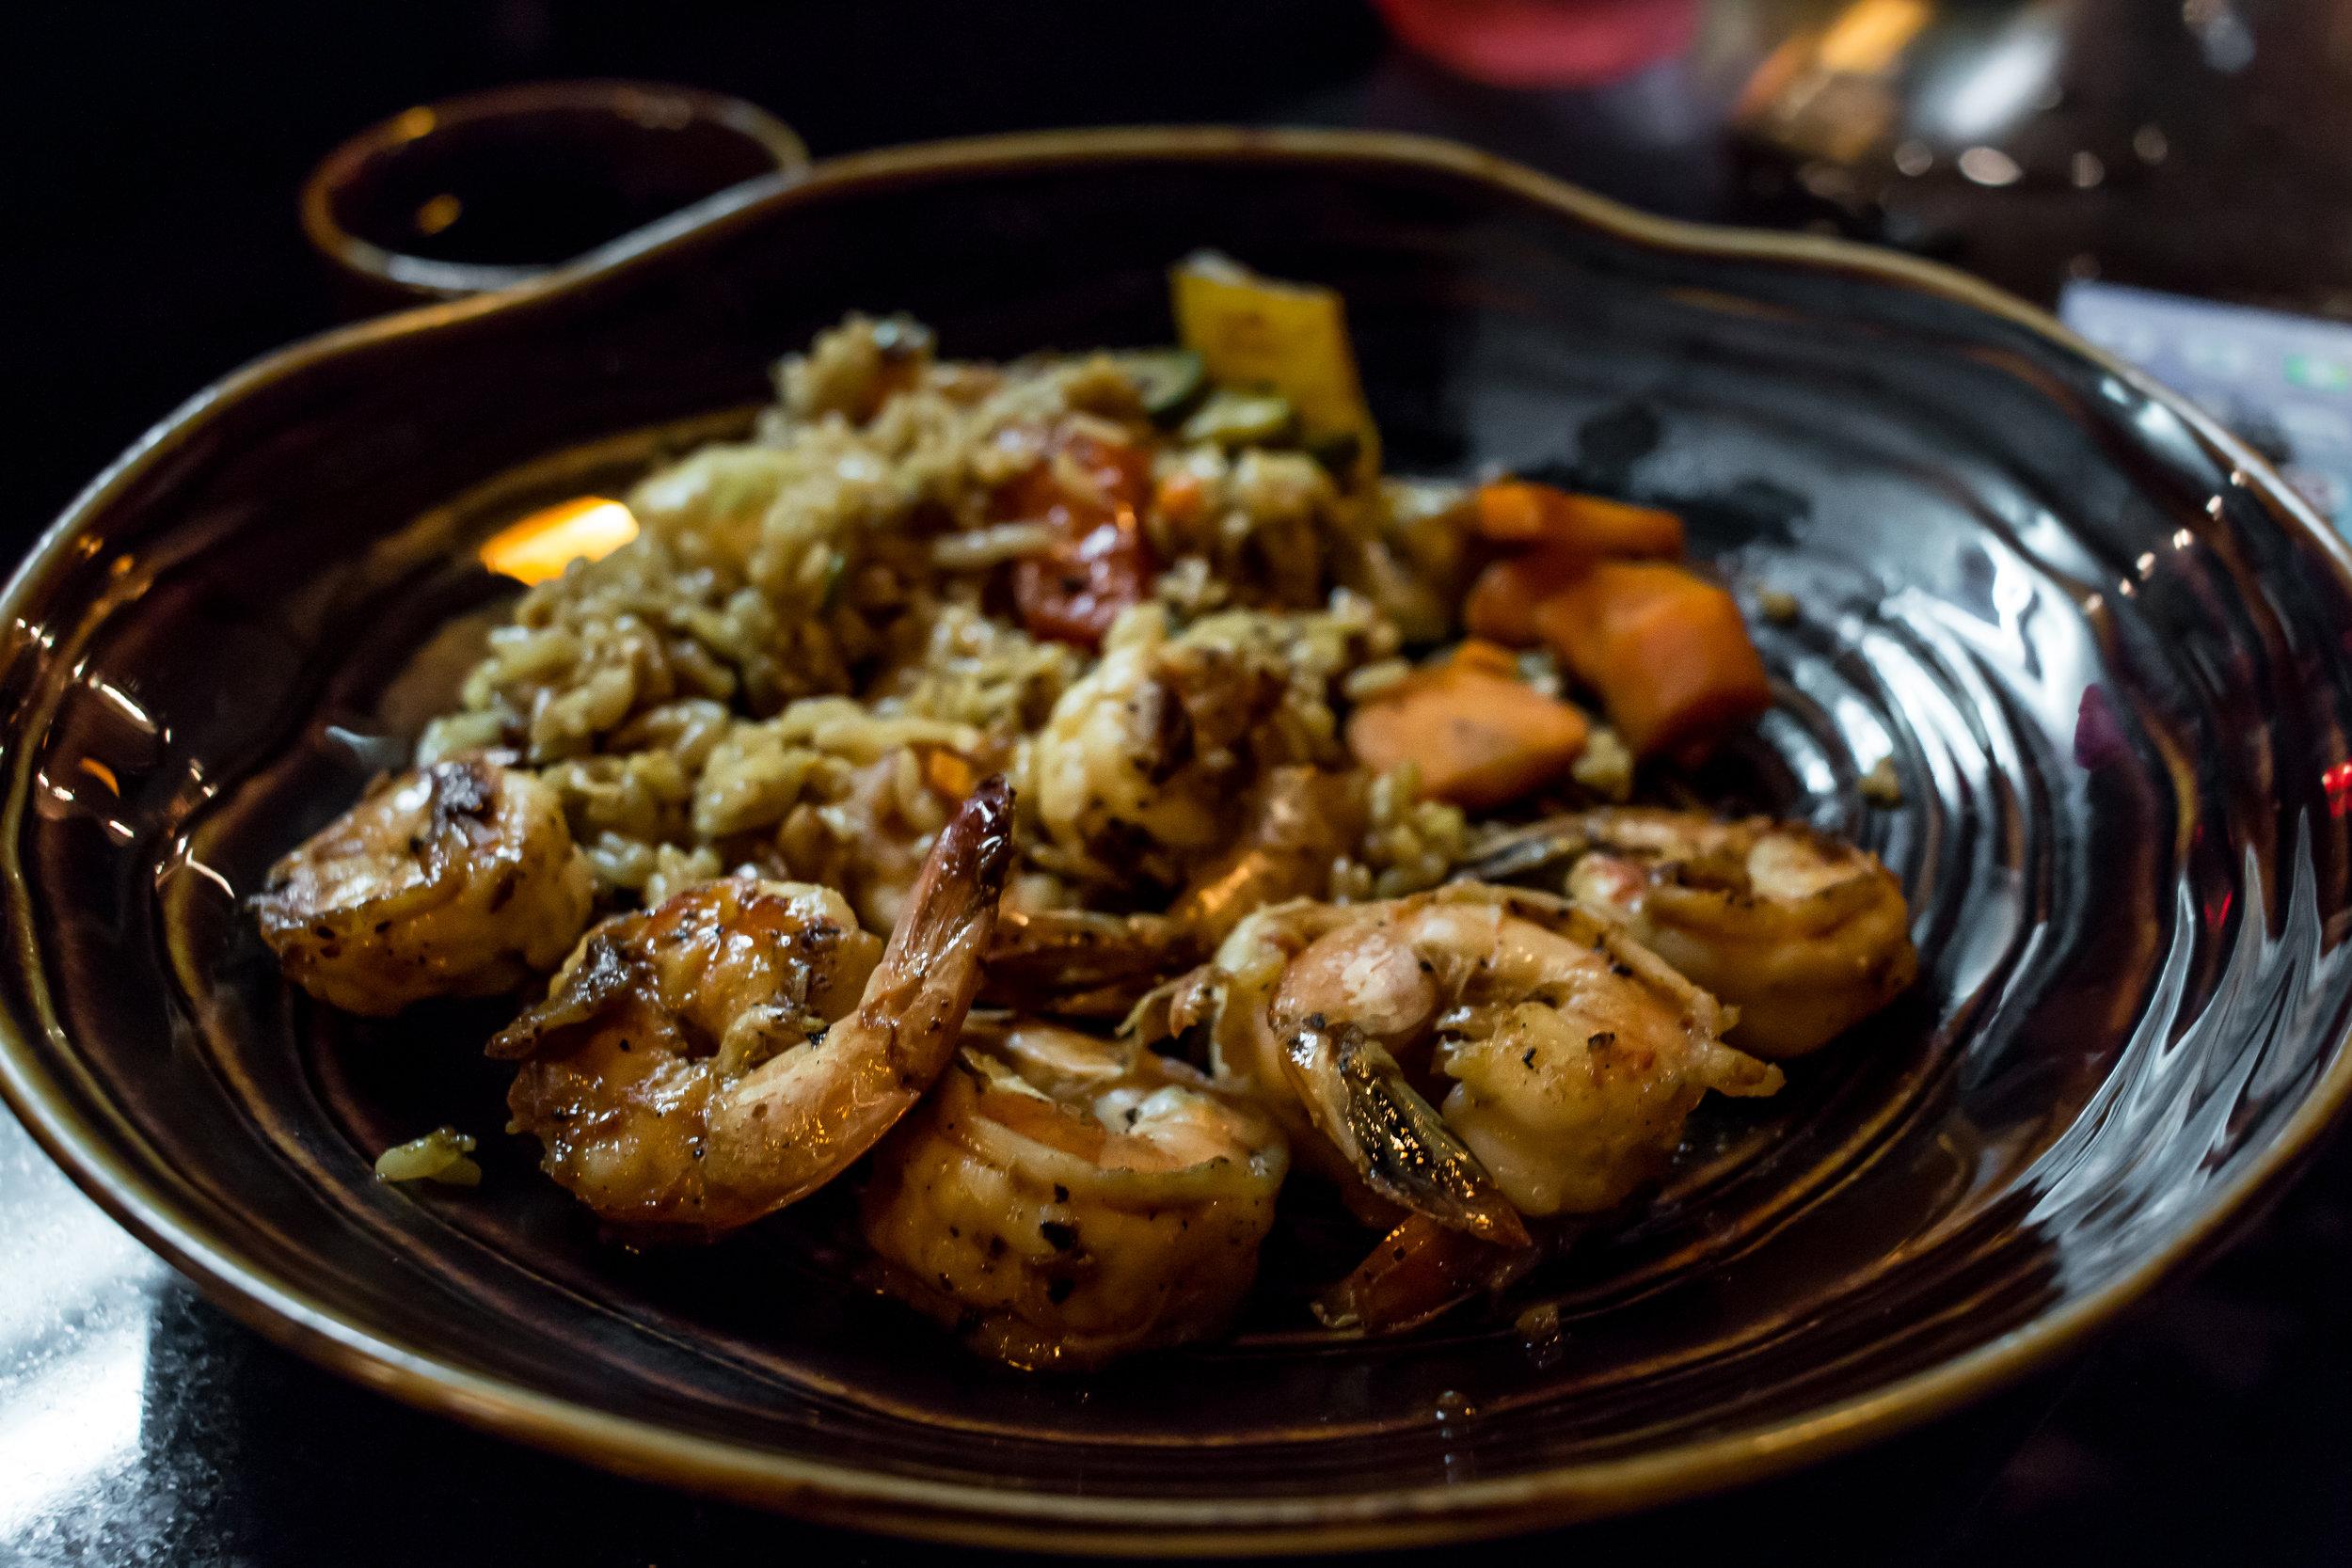 Edited Shrimp and rice.jpg